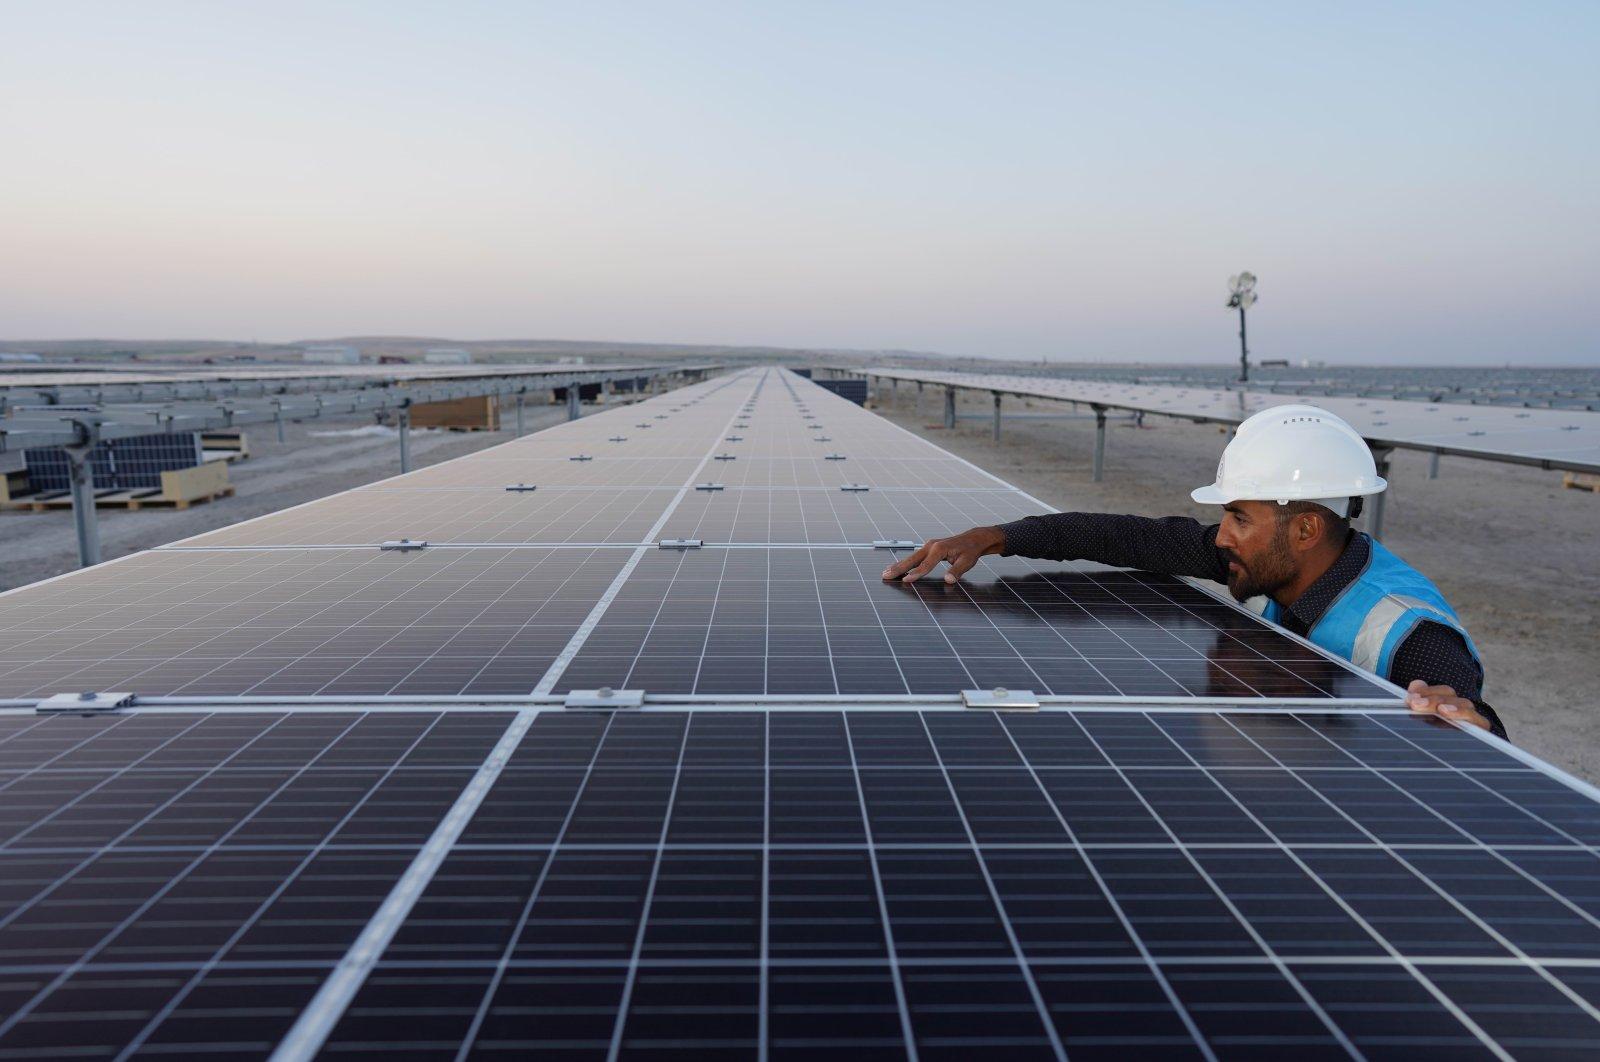 An employee works next to the solar power panels in the Karapınar Solar Power Plant, Konya, central Turkey, Sept. 29, 2020. (IHA Photo)